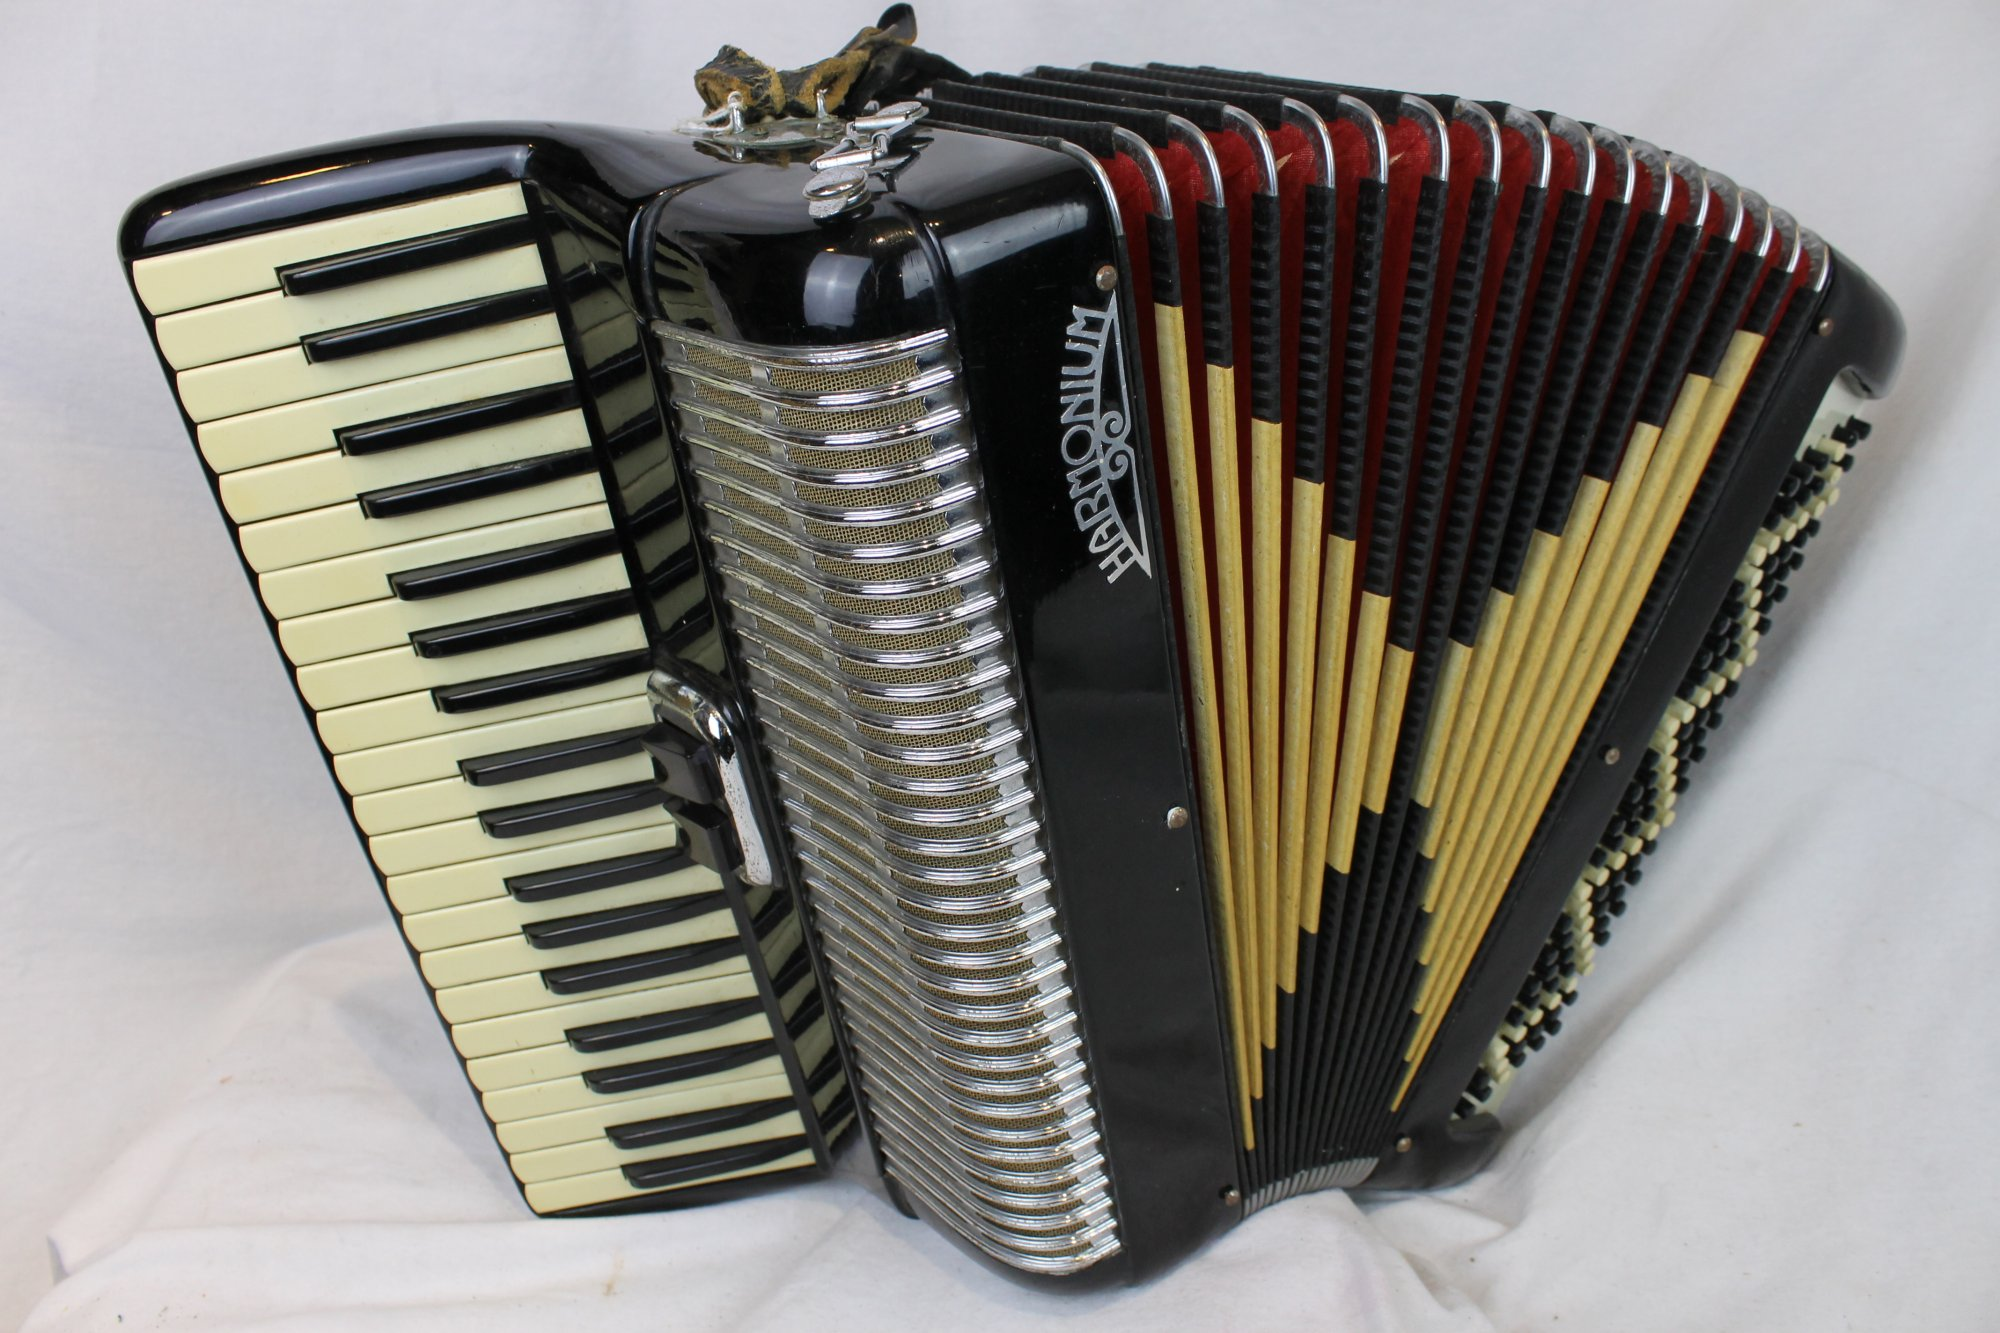 3624 - Black Harmonium Piano Accordion LM 39 120